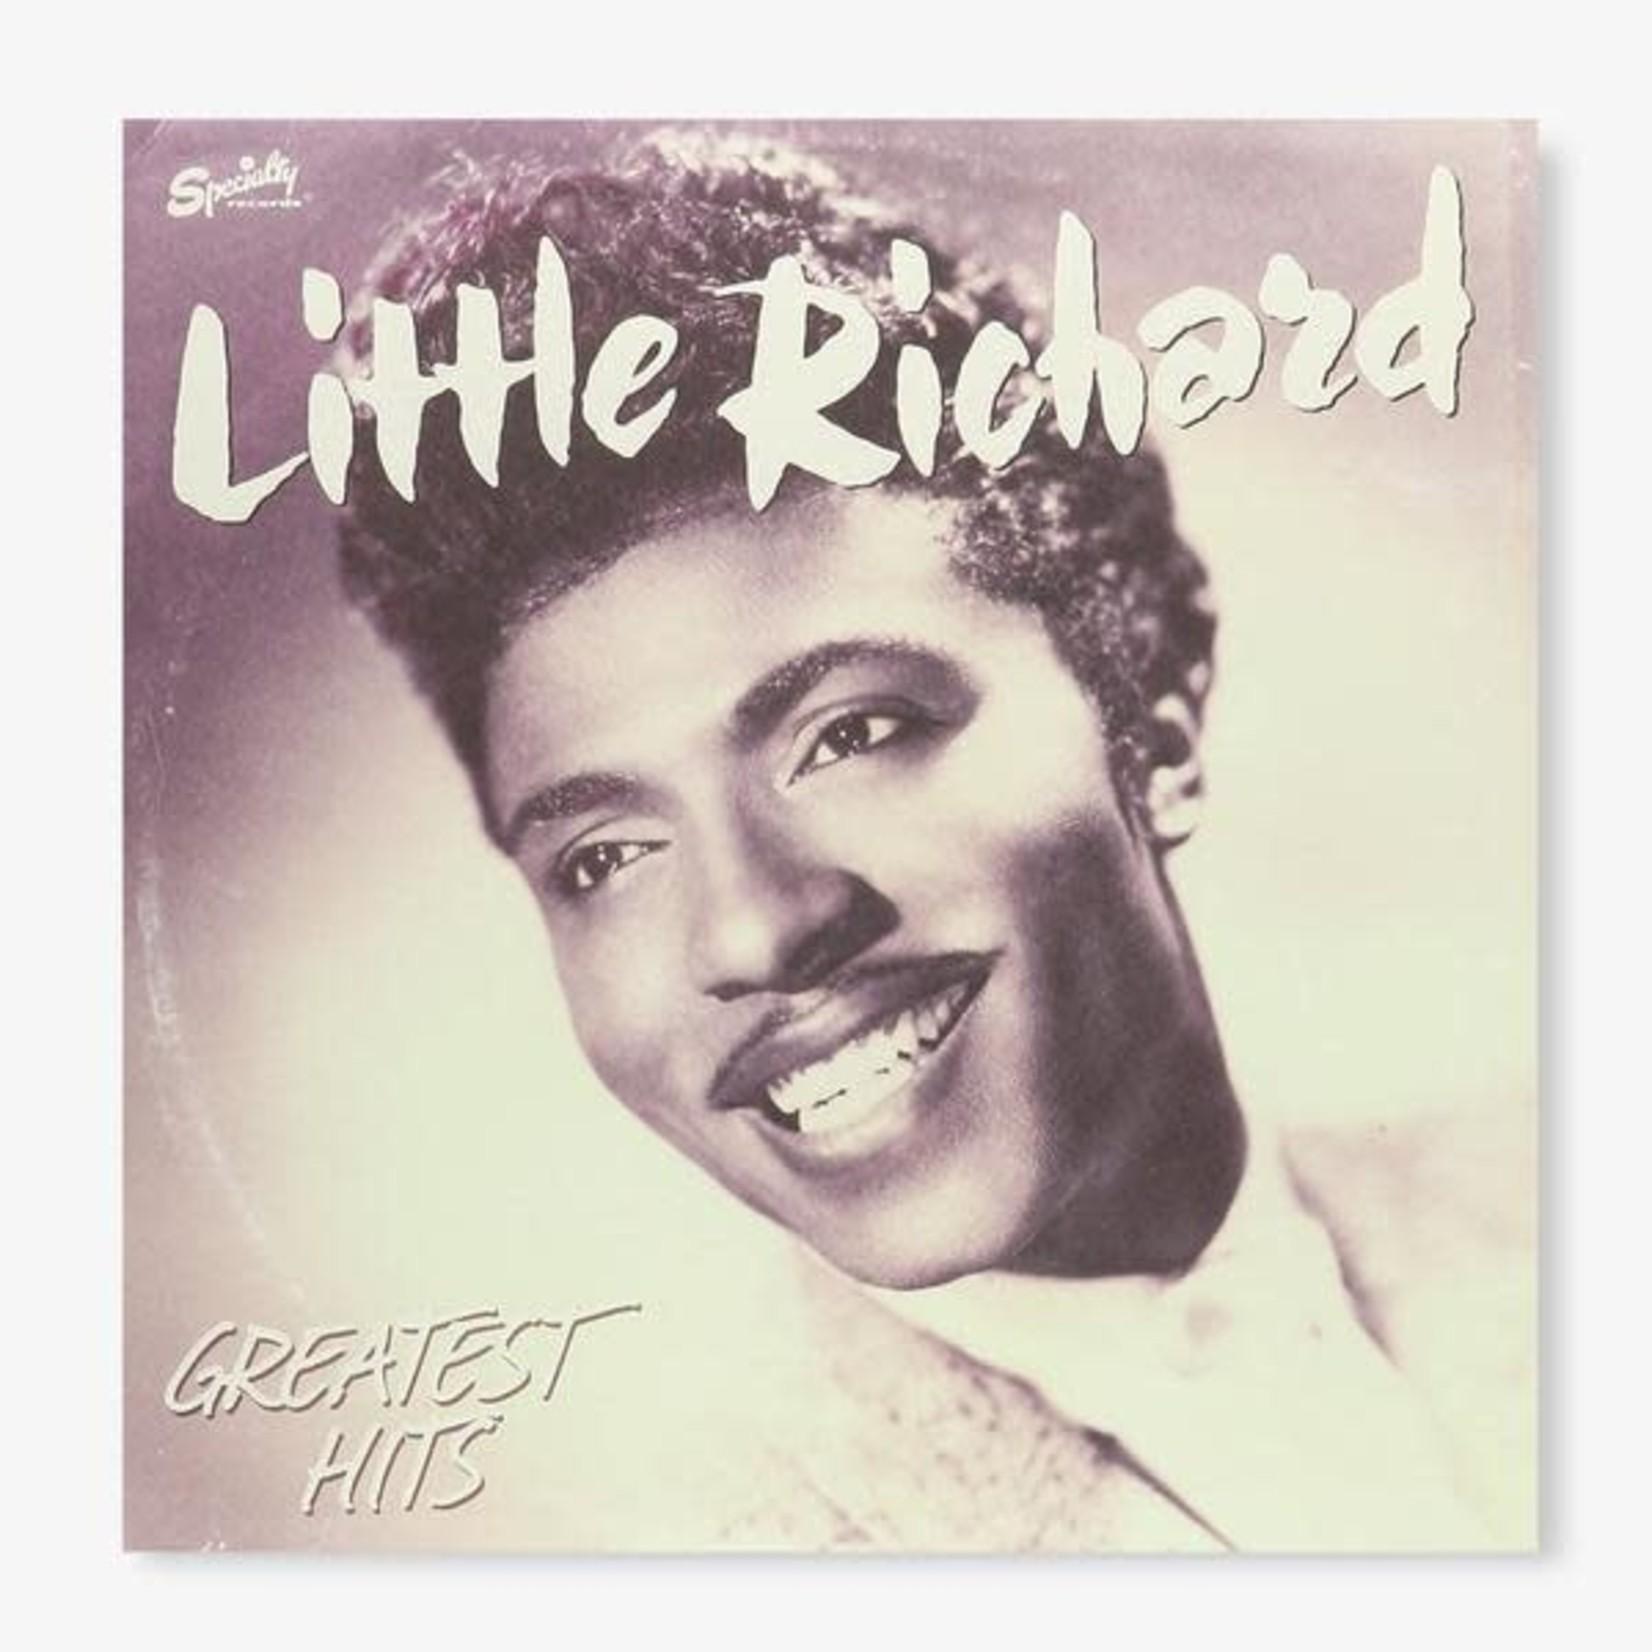 Vinyl Little Richard - Greatest Hits